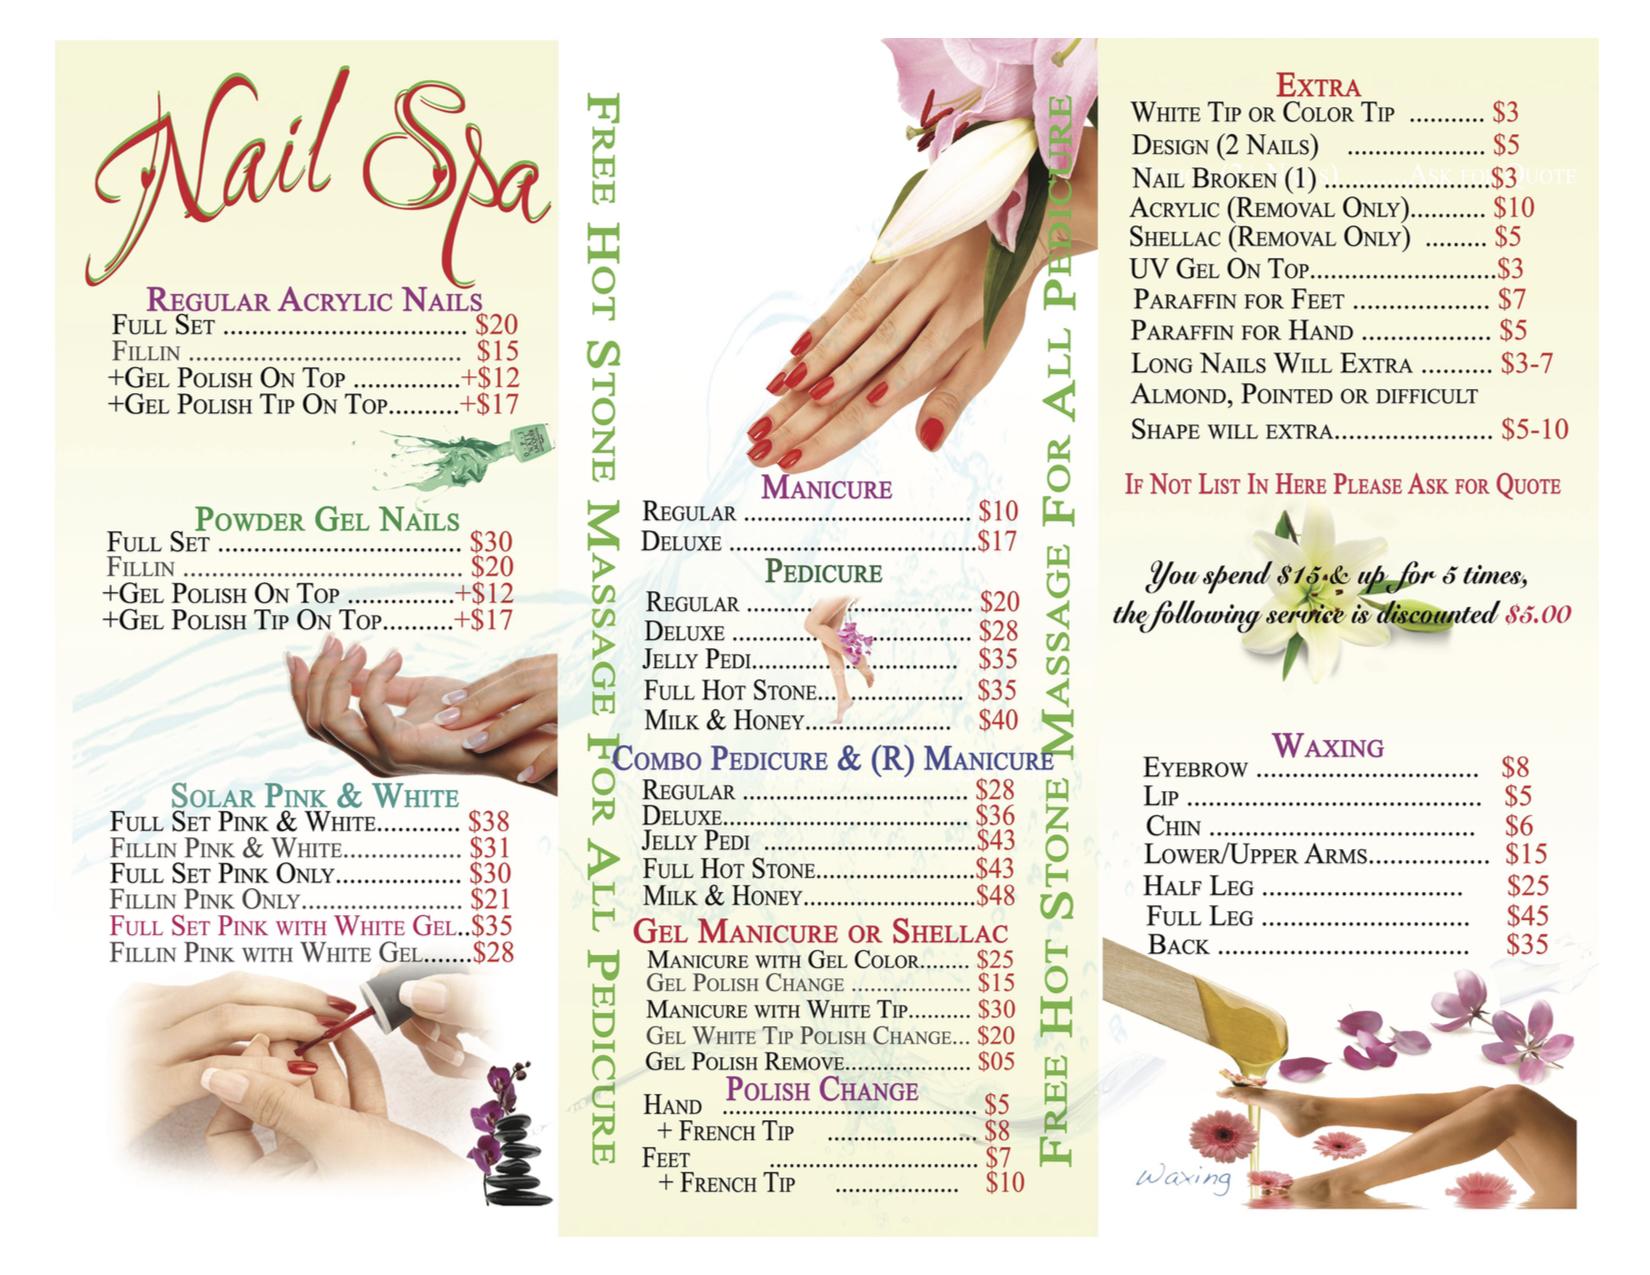 Spa Waxing Price List